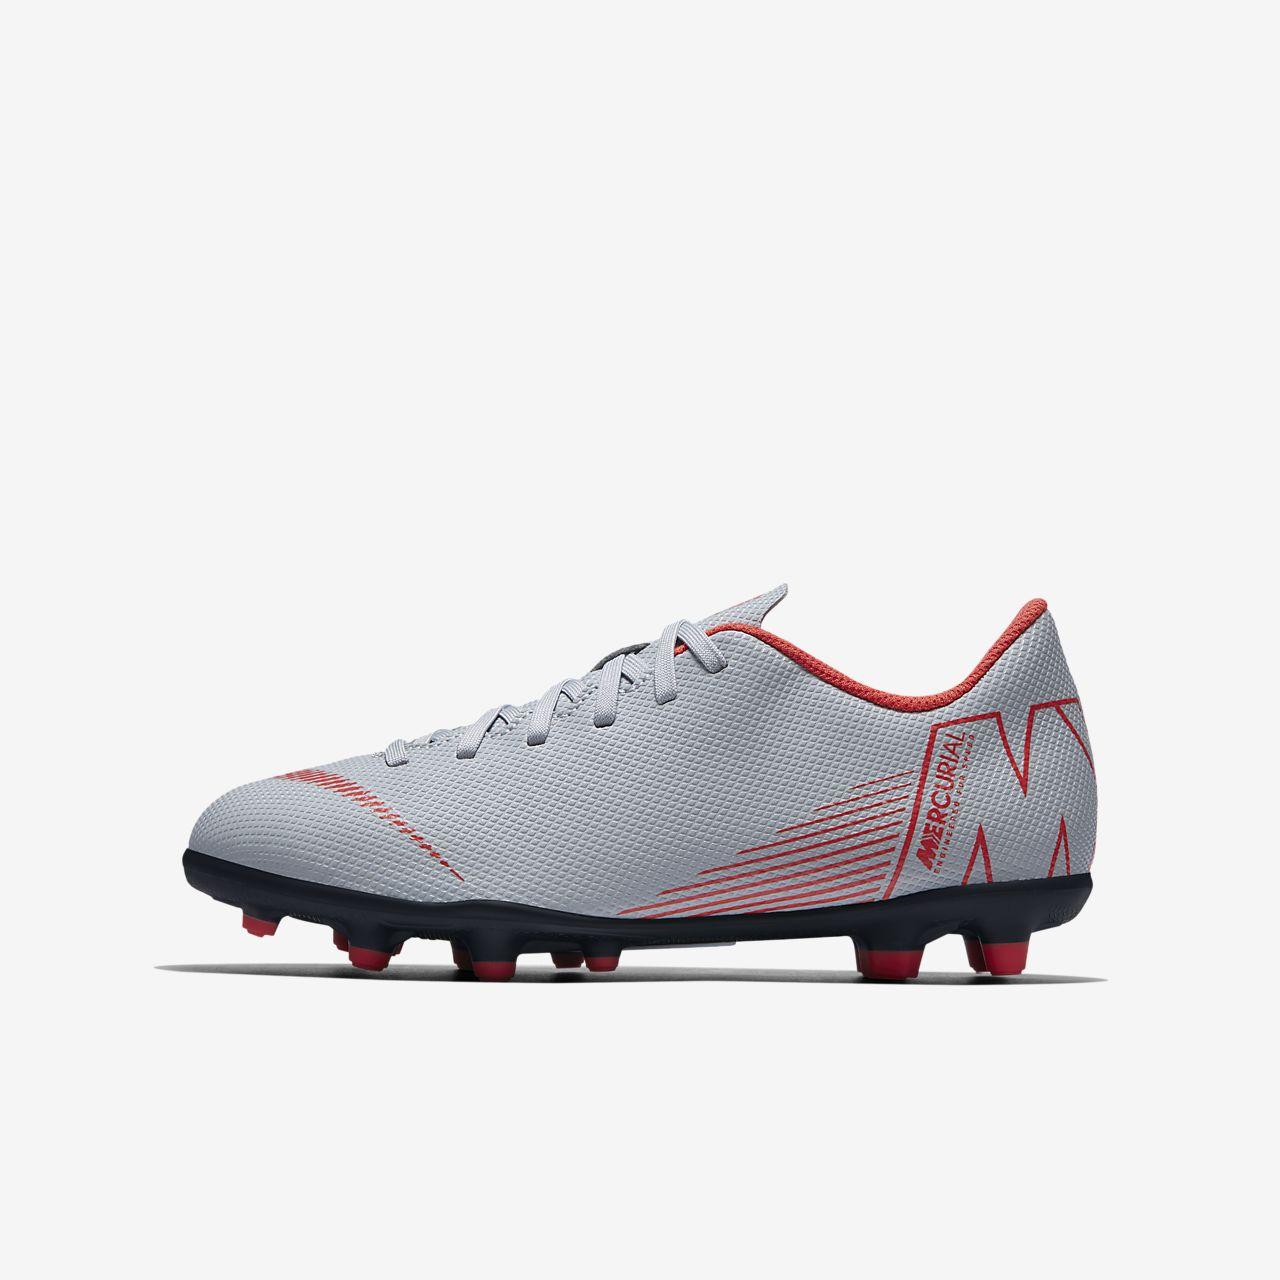 los angeles f7651 29f04 ... buy chaussure de football multi terrains à crampons nike jr. mercurial  vapor xii club pour